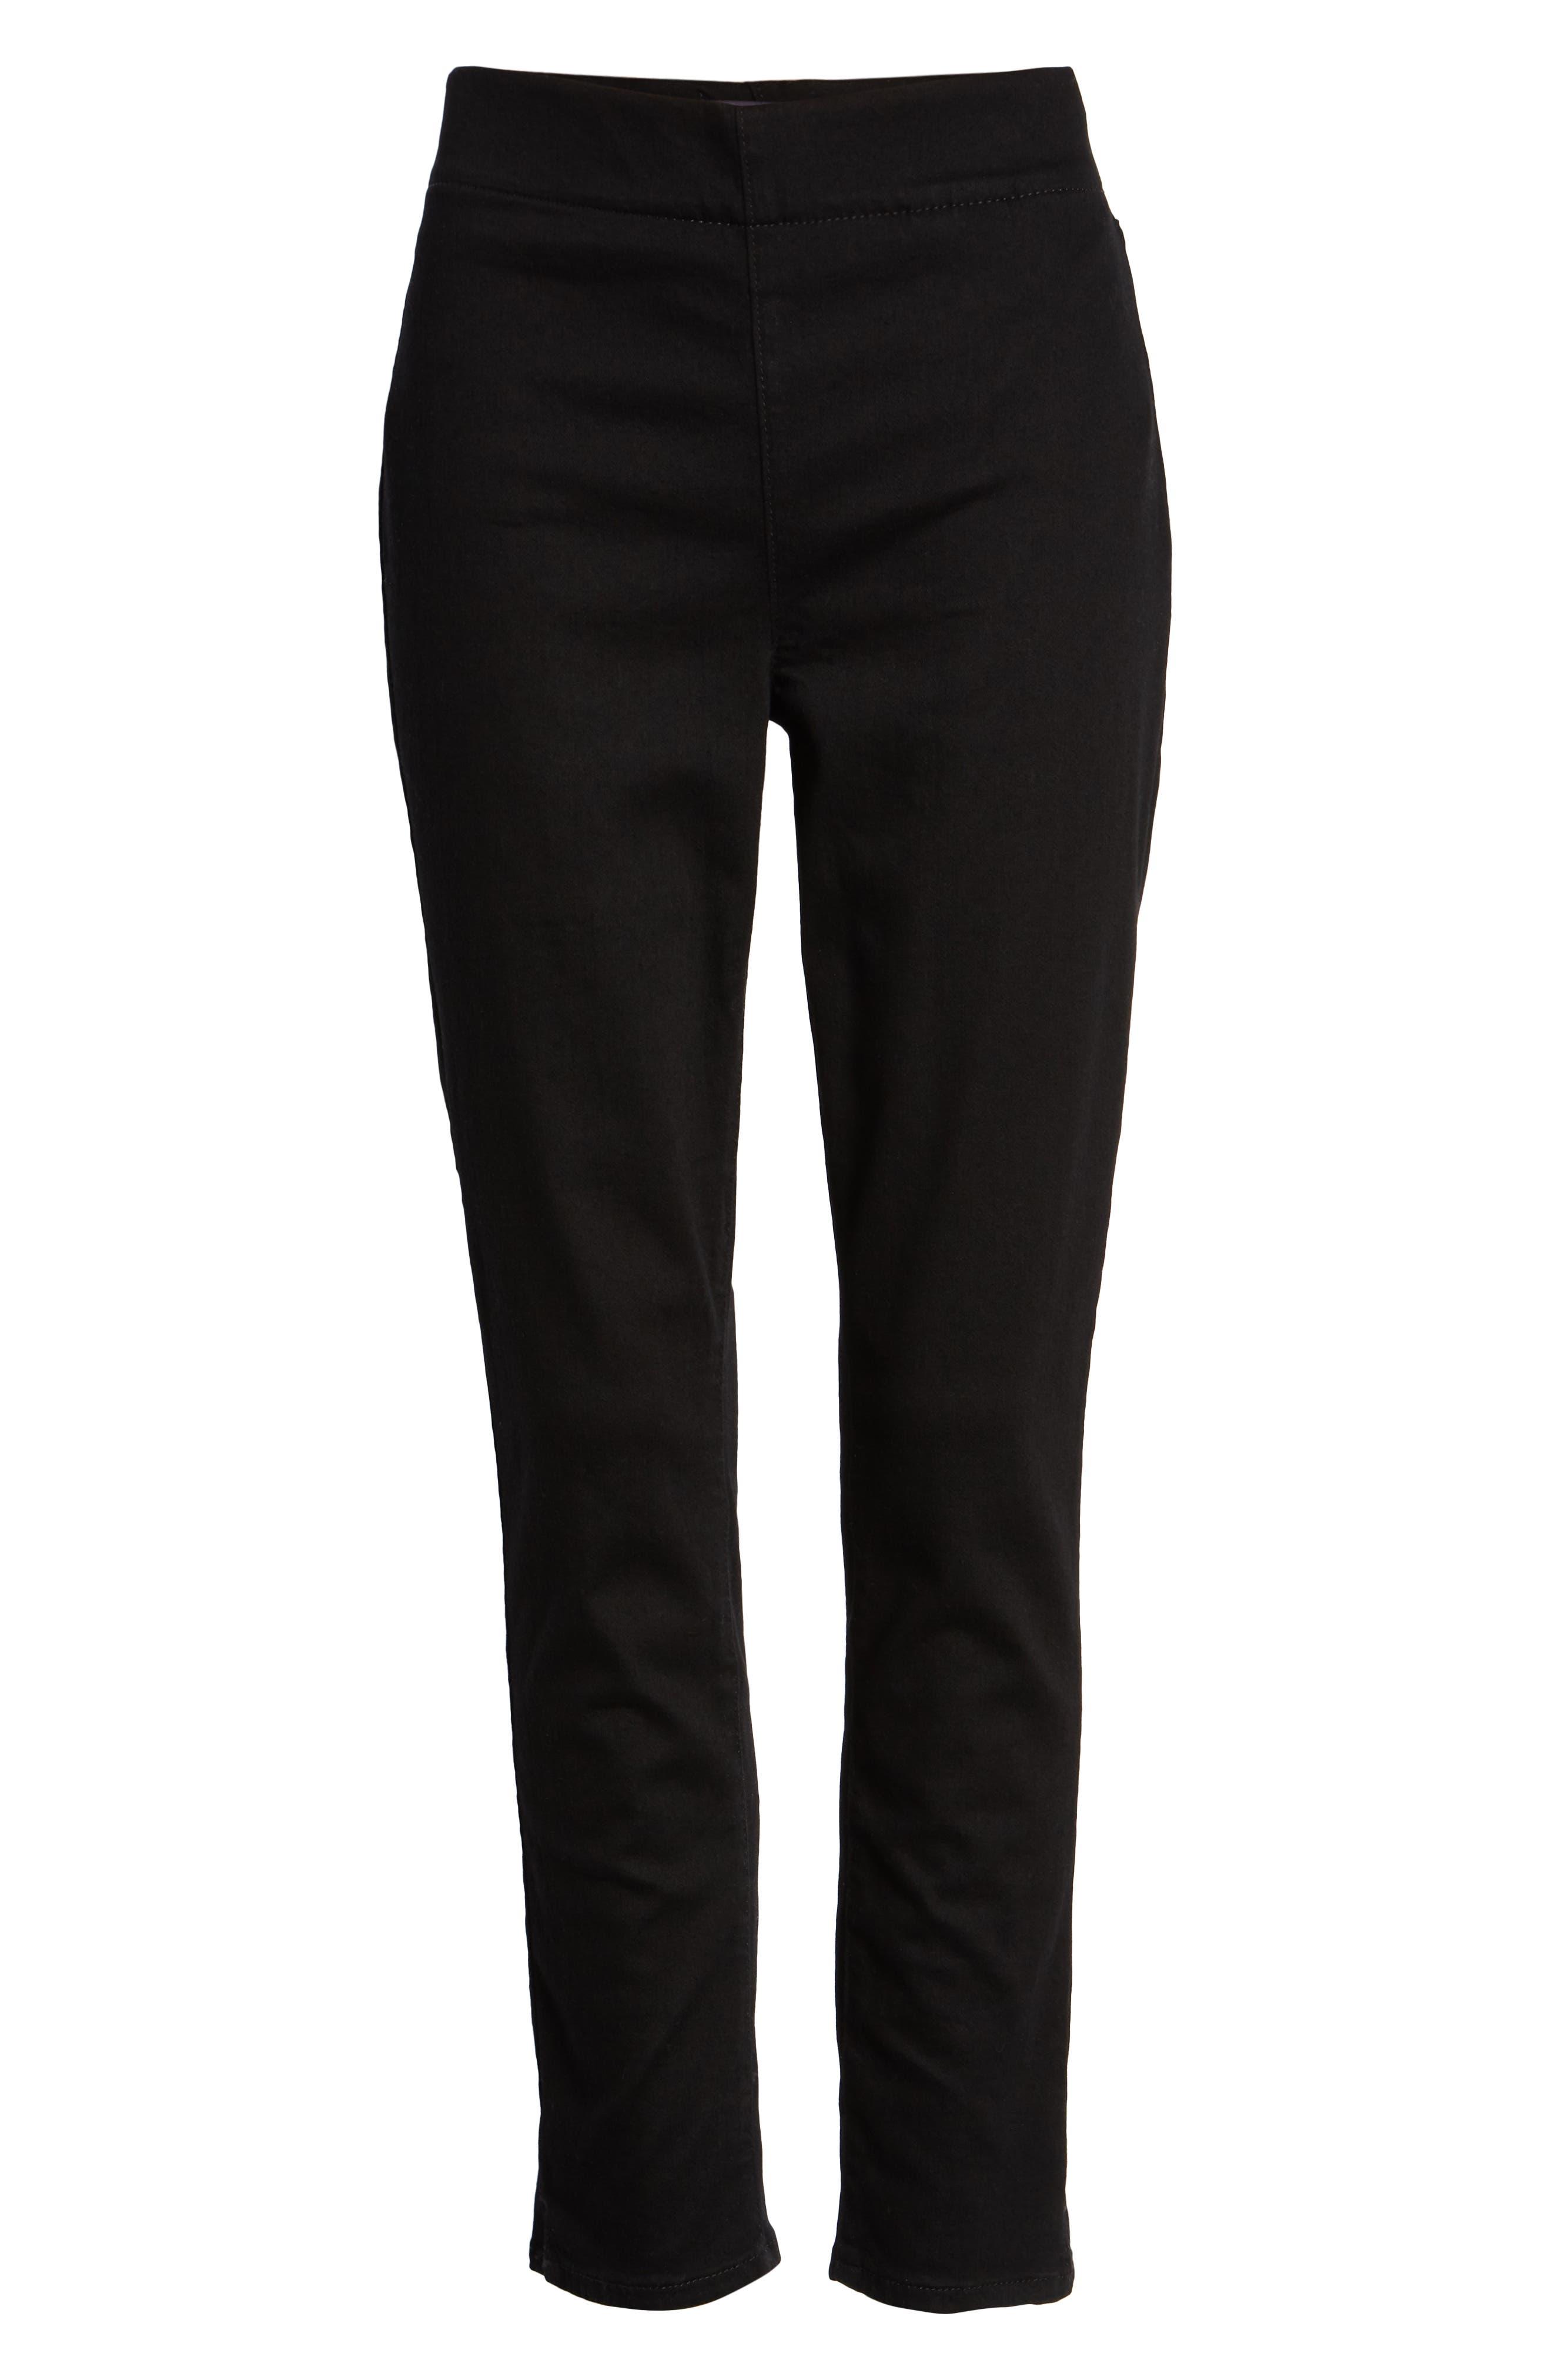 Alina High Waist Pull-On Ankle Skinny Jeans,                             Alternate thumbnail 4, color,                             BLACK